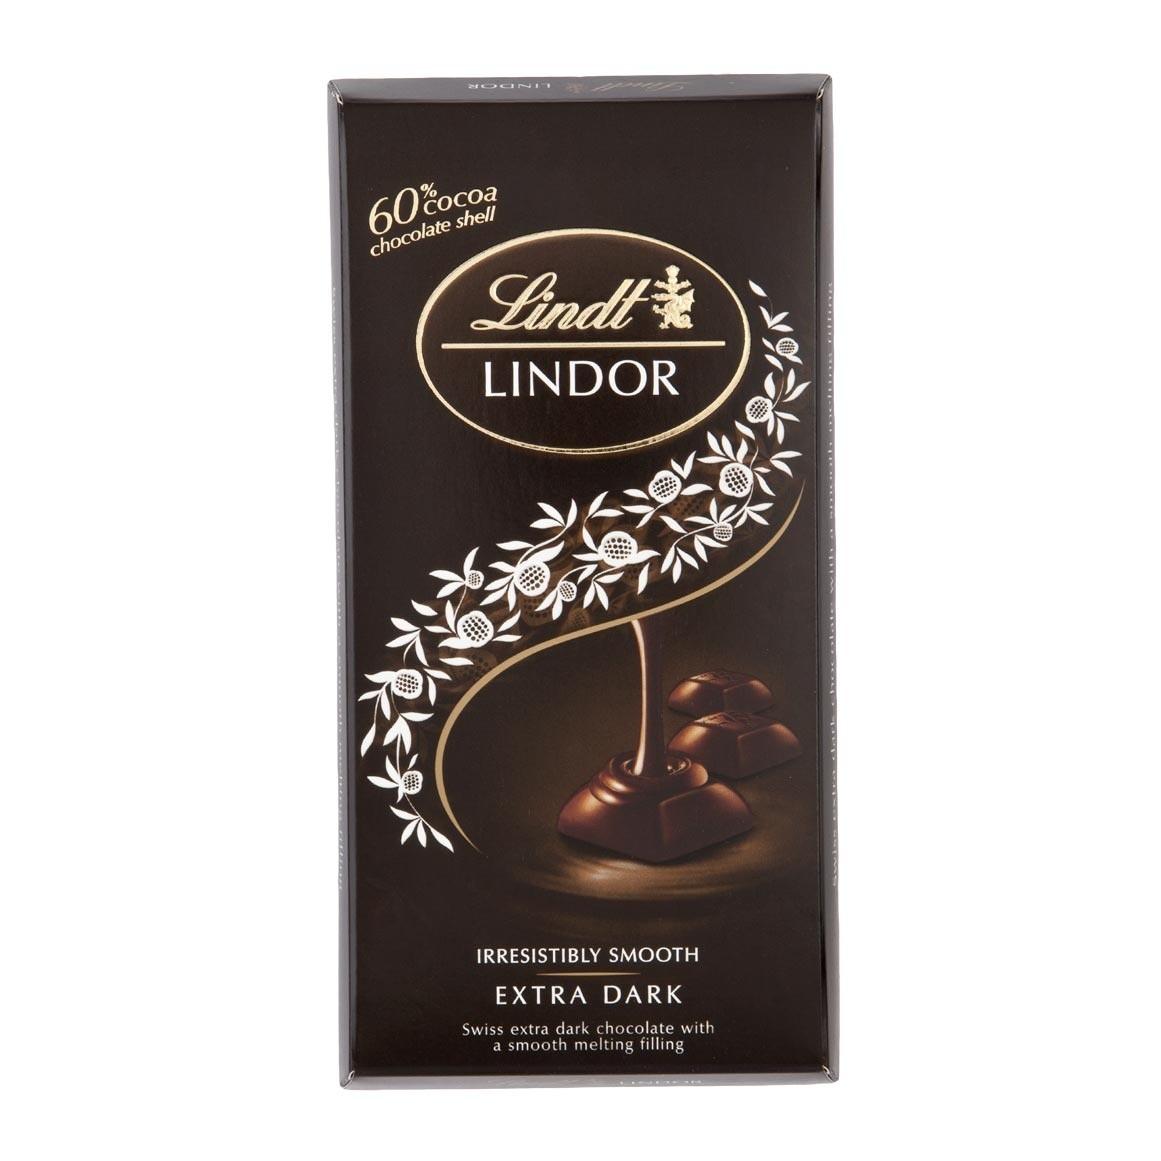 lindt-lindor-extra-dark-chocolate-100g-7610400074155